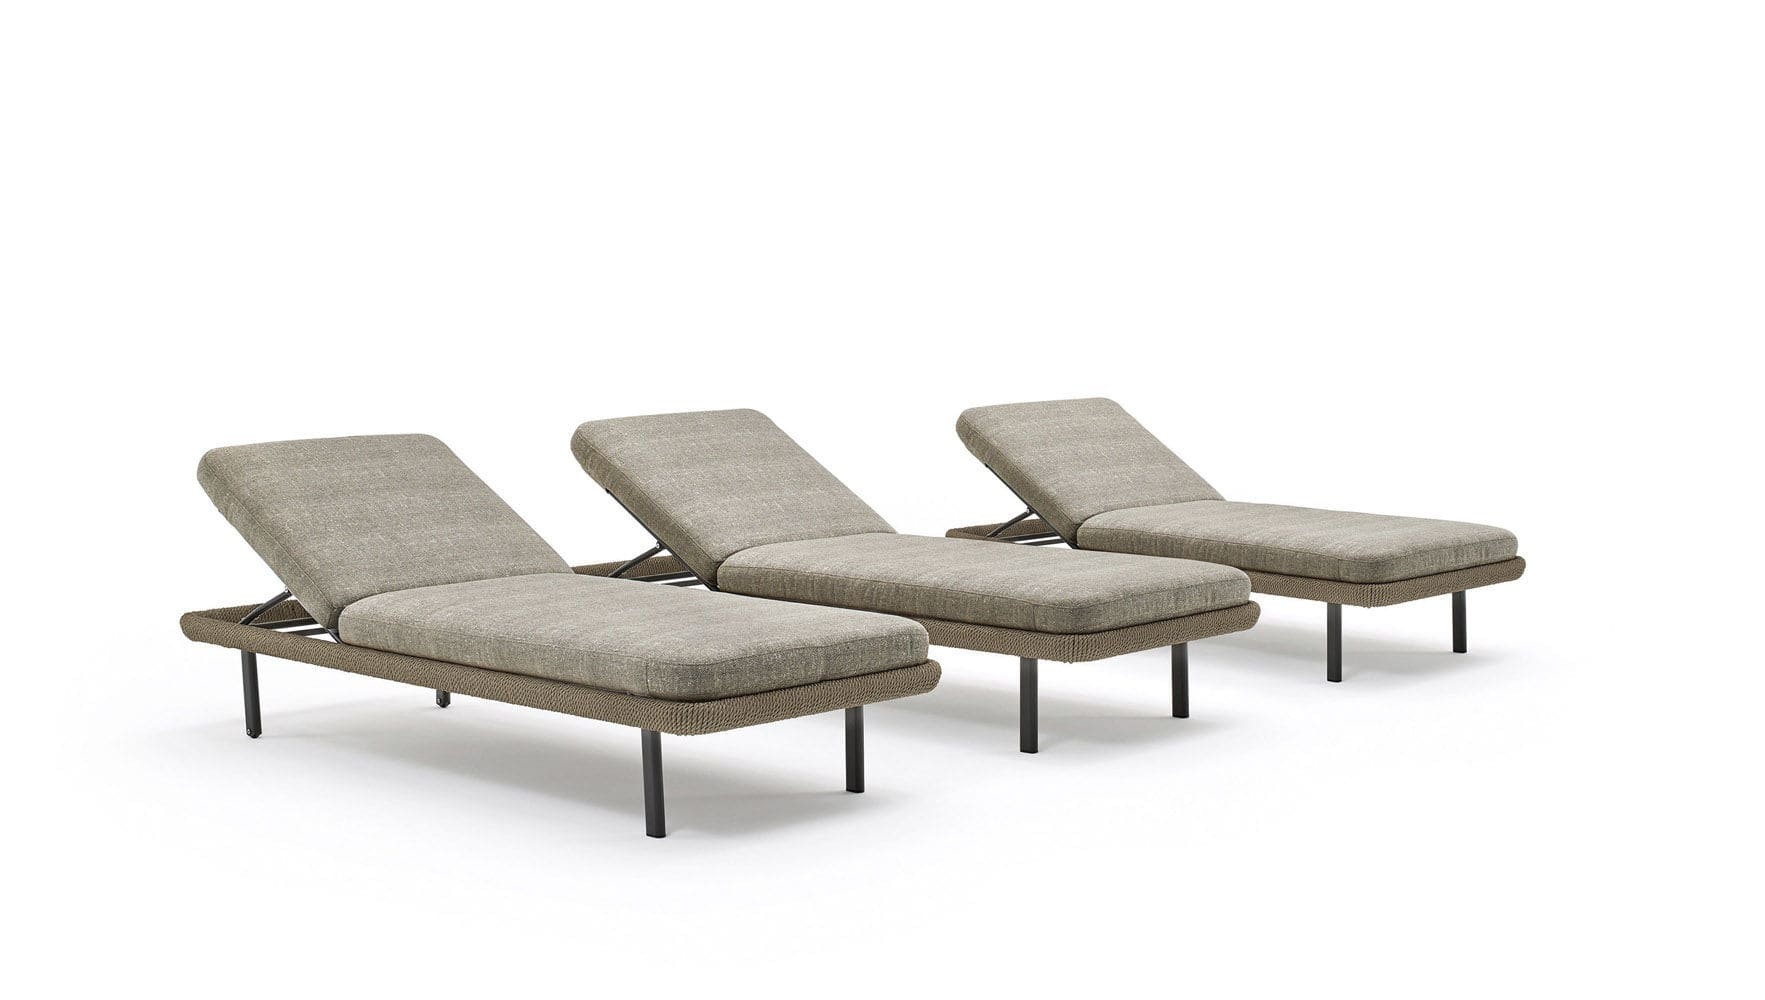 gartenliege modern top gartenliege modern with gartenliege modern simple moderne holz ikea. Black Bedroom Furniture Sets. Home Design Ideas